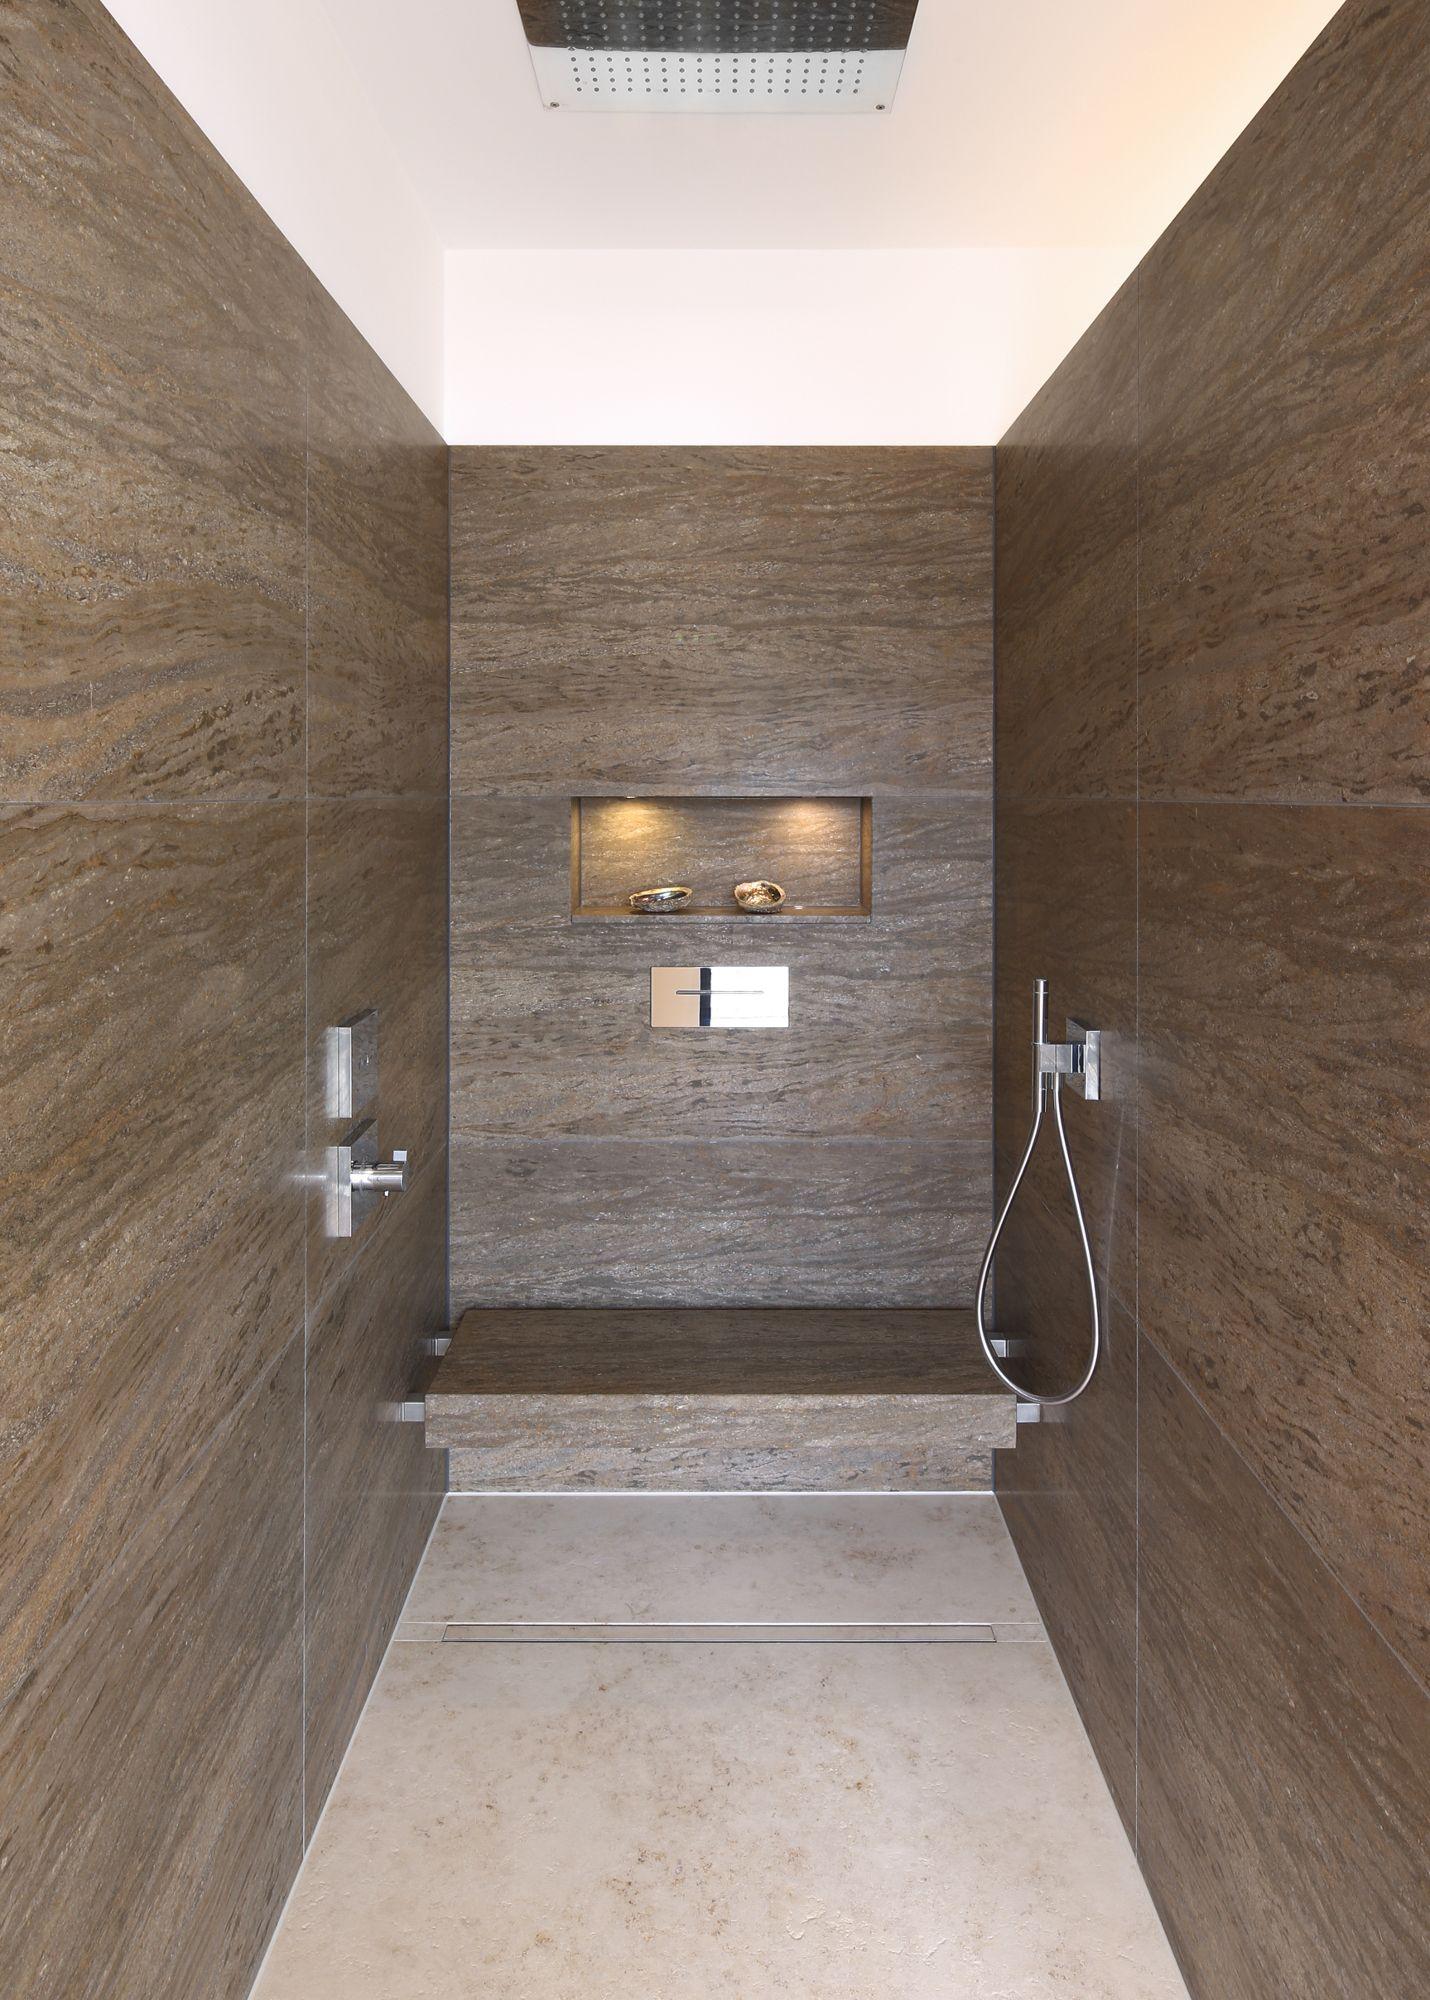 neueste begehbare dusche fliesen anleitung schema garten design ideen. Black Bedroom Furniture Sets. Home Design Ideas